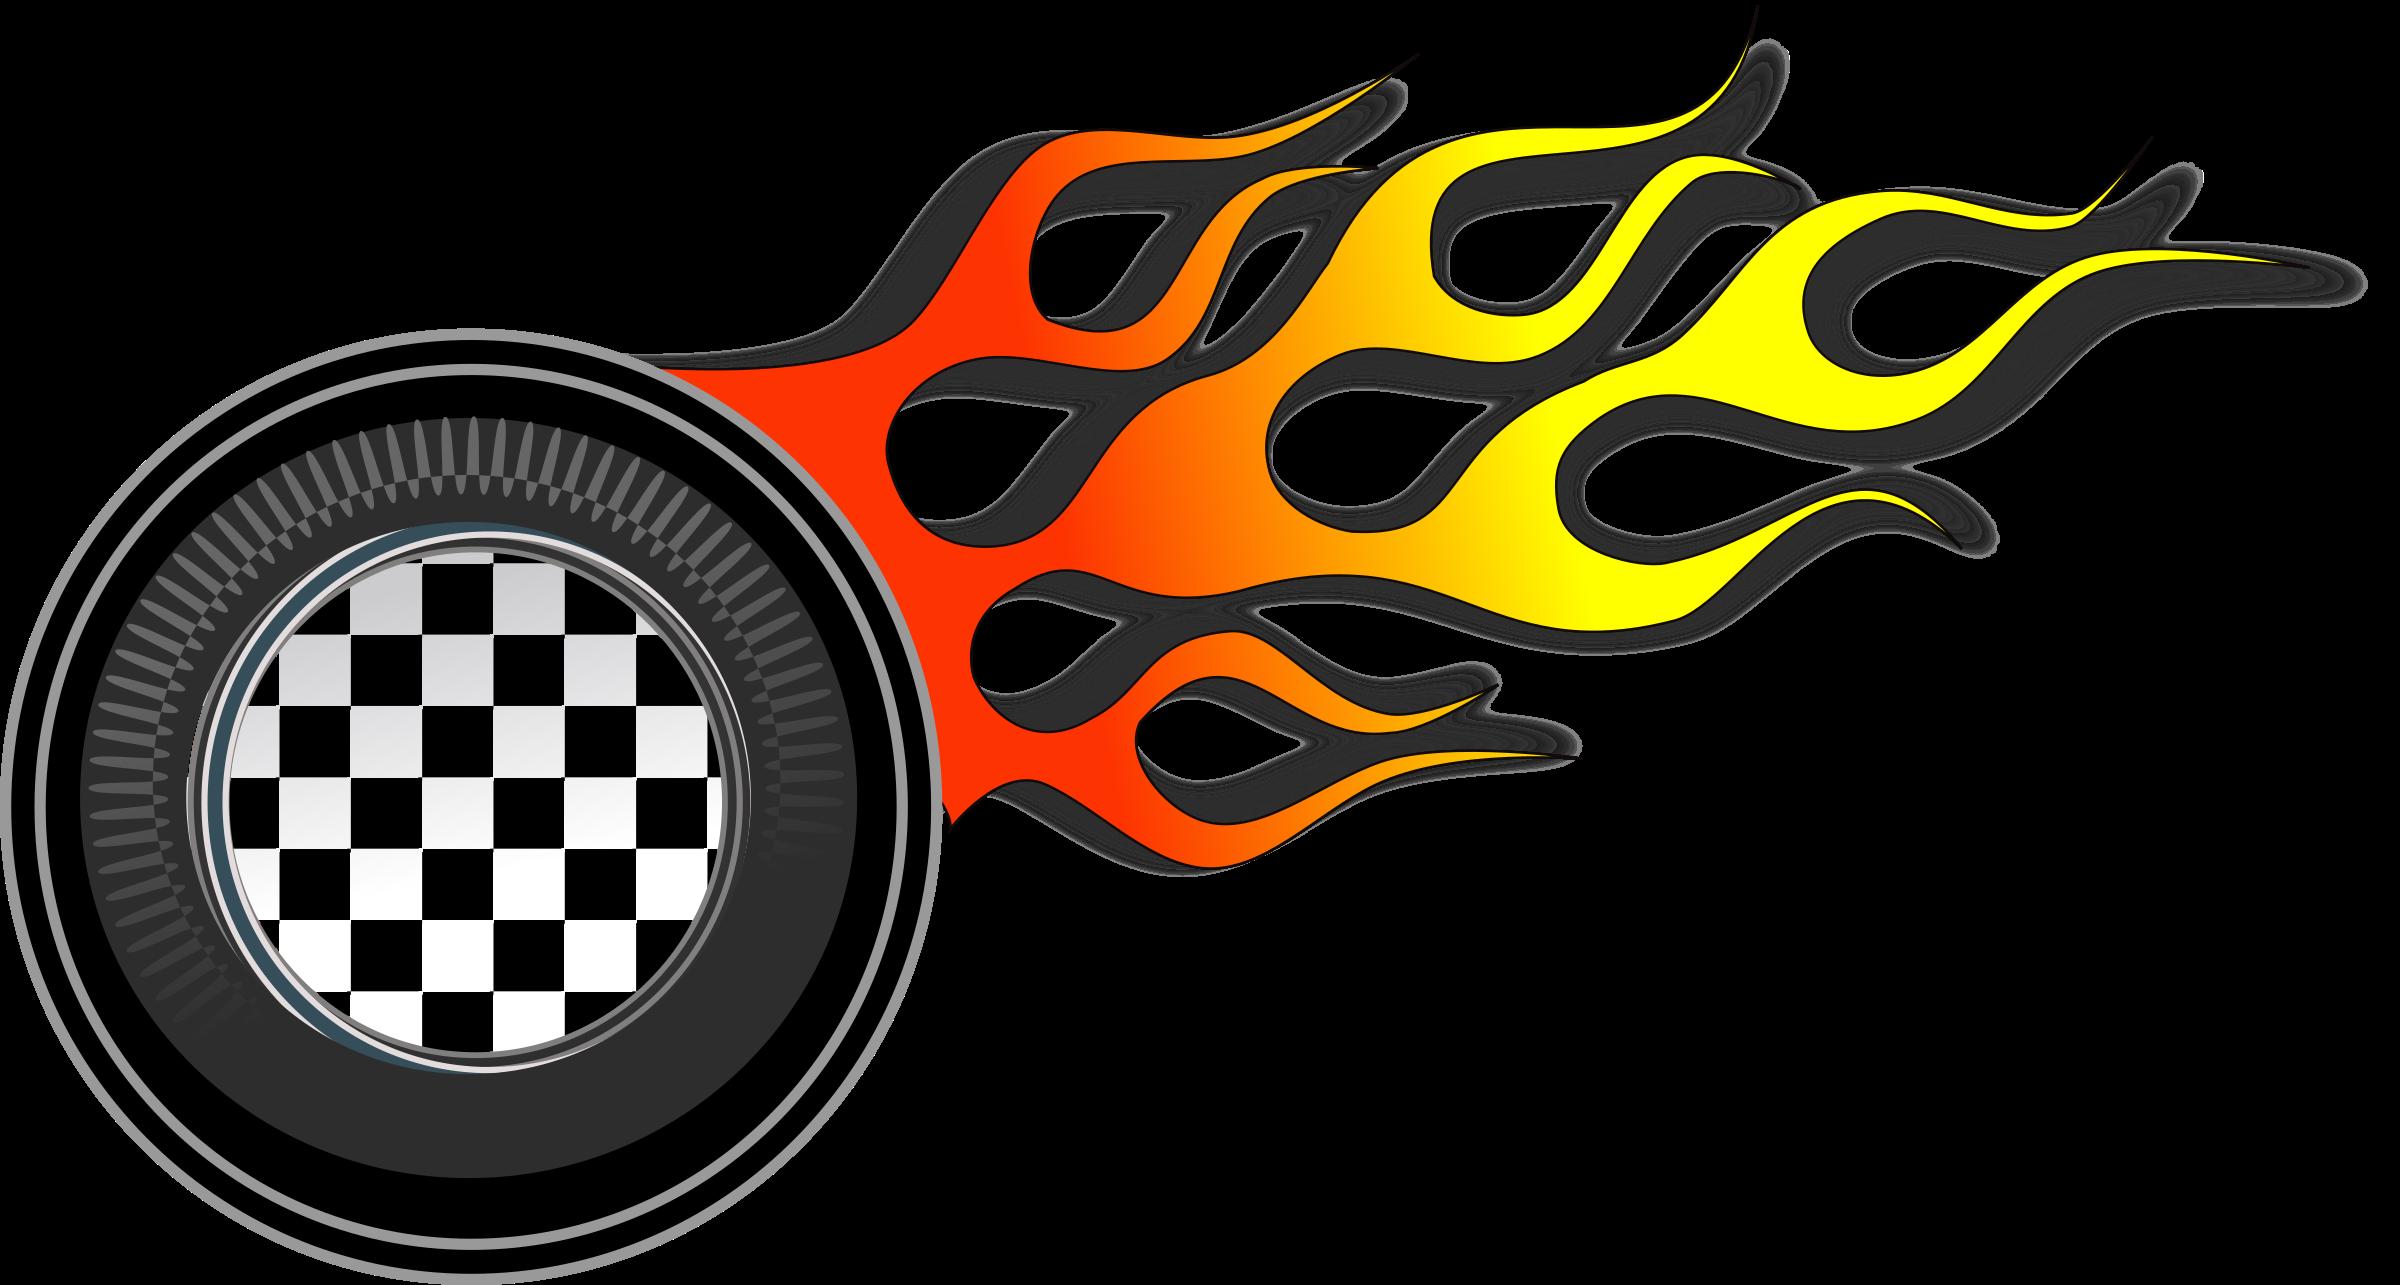 Hot Wheels clipart motor racing Racing Wheel Wheel Clipart Racing